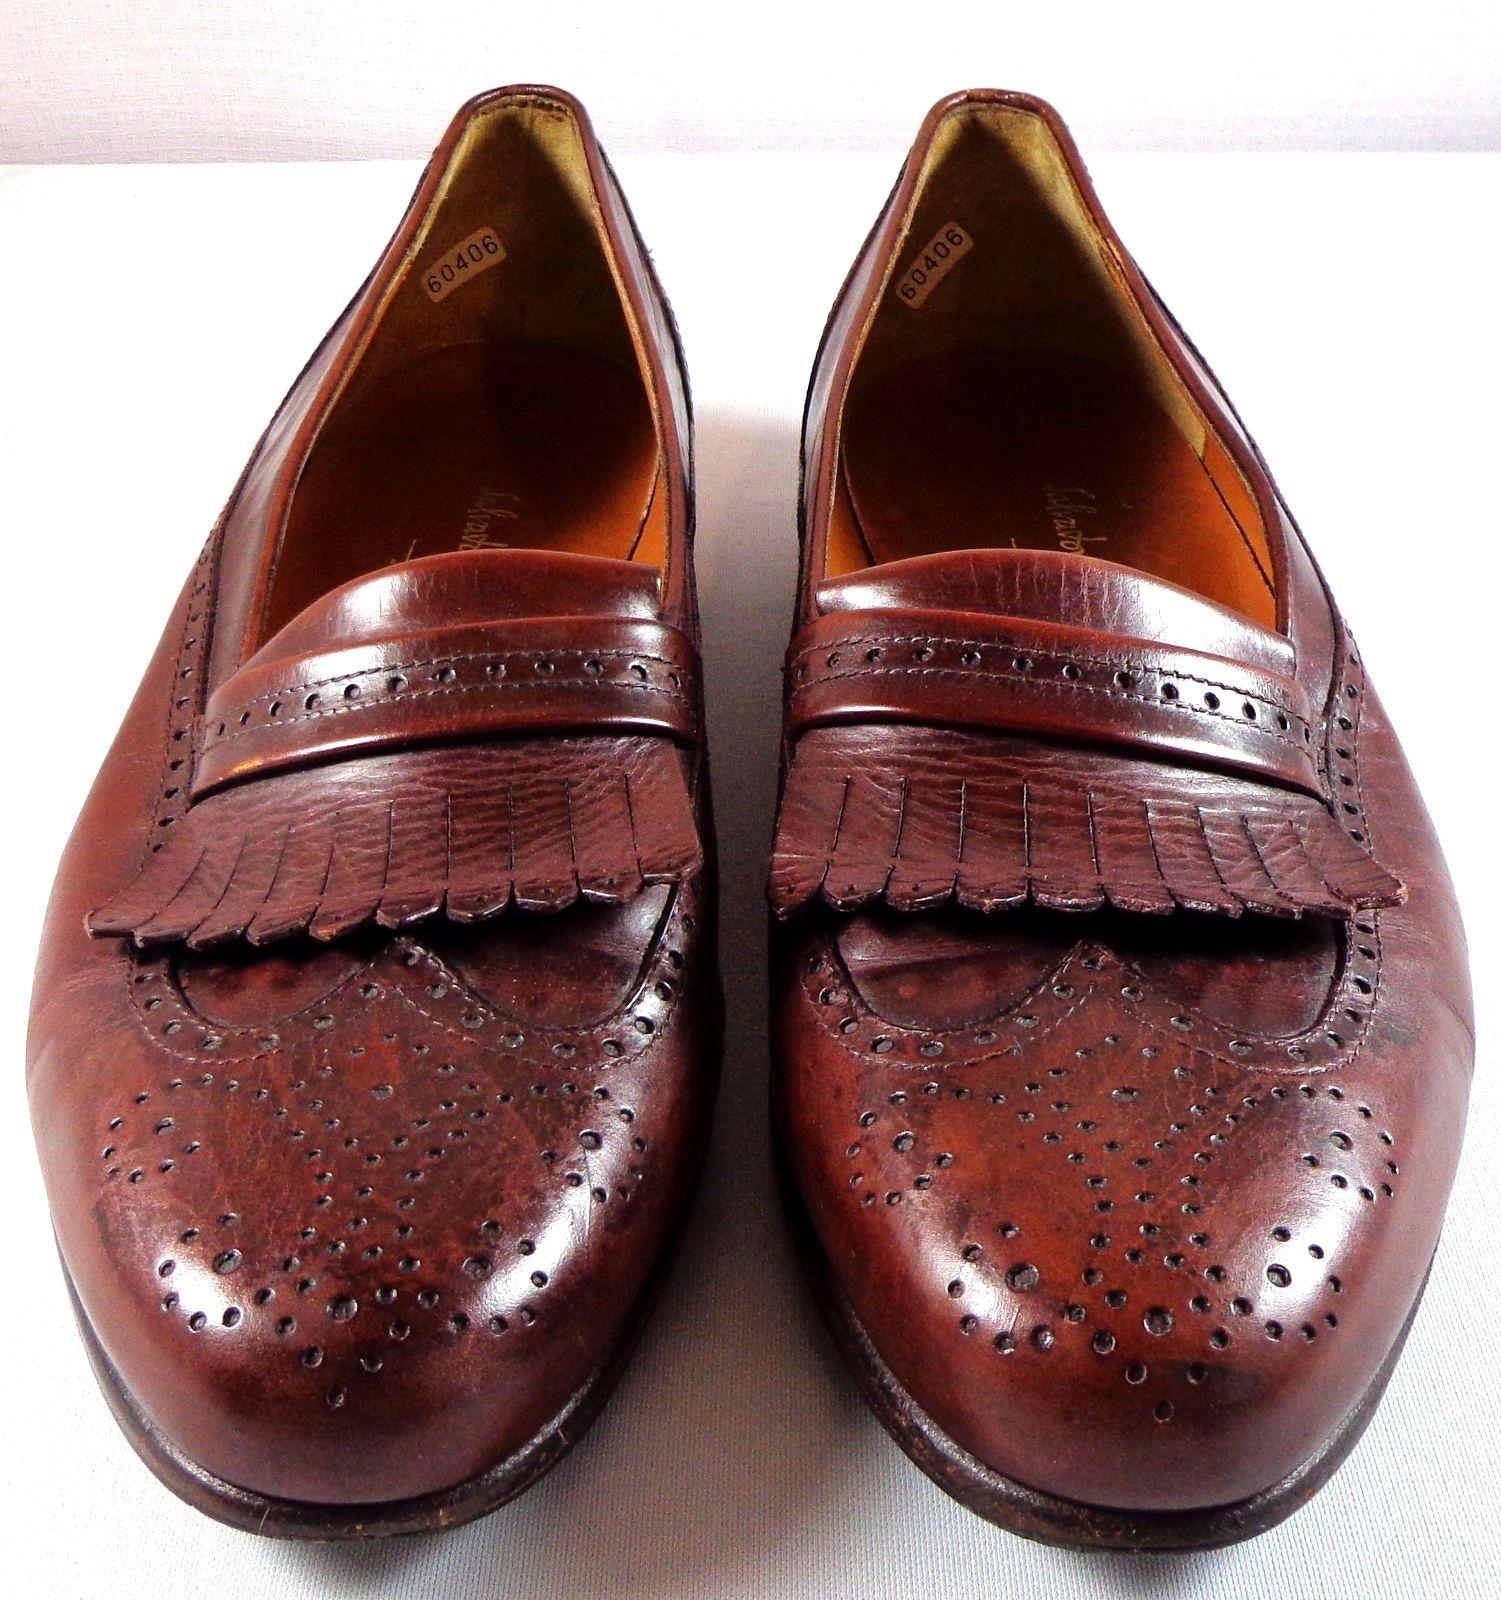 07442cefb0458 Salvatore Ferragamo Wingtip Kiltie Dress Shoes Mens 10 D Brown Leather Slip  On - $148.45